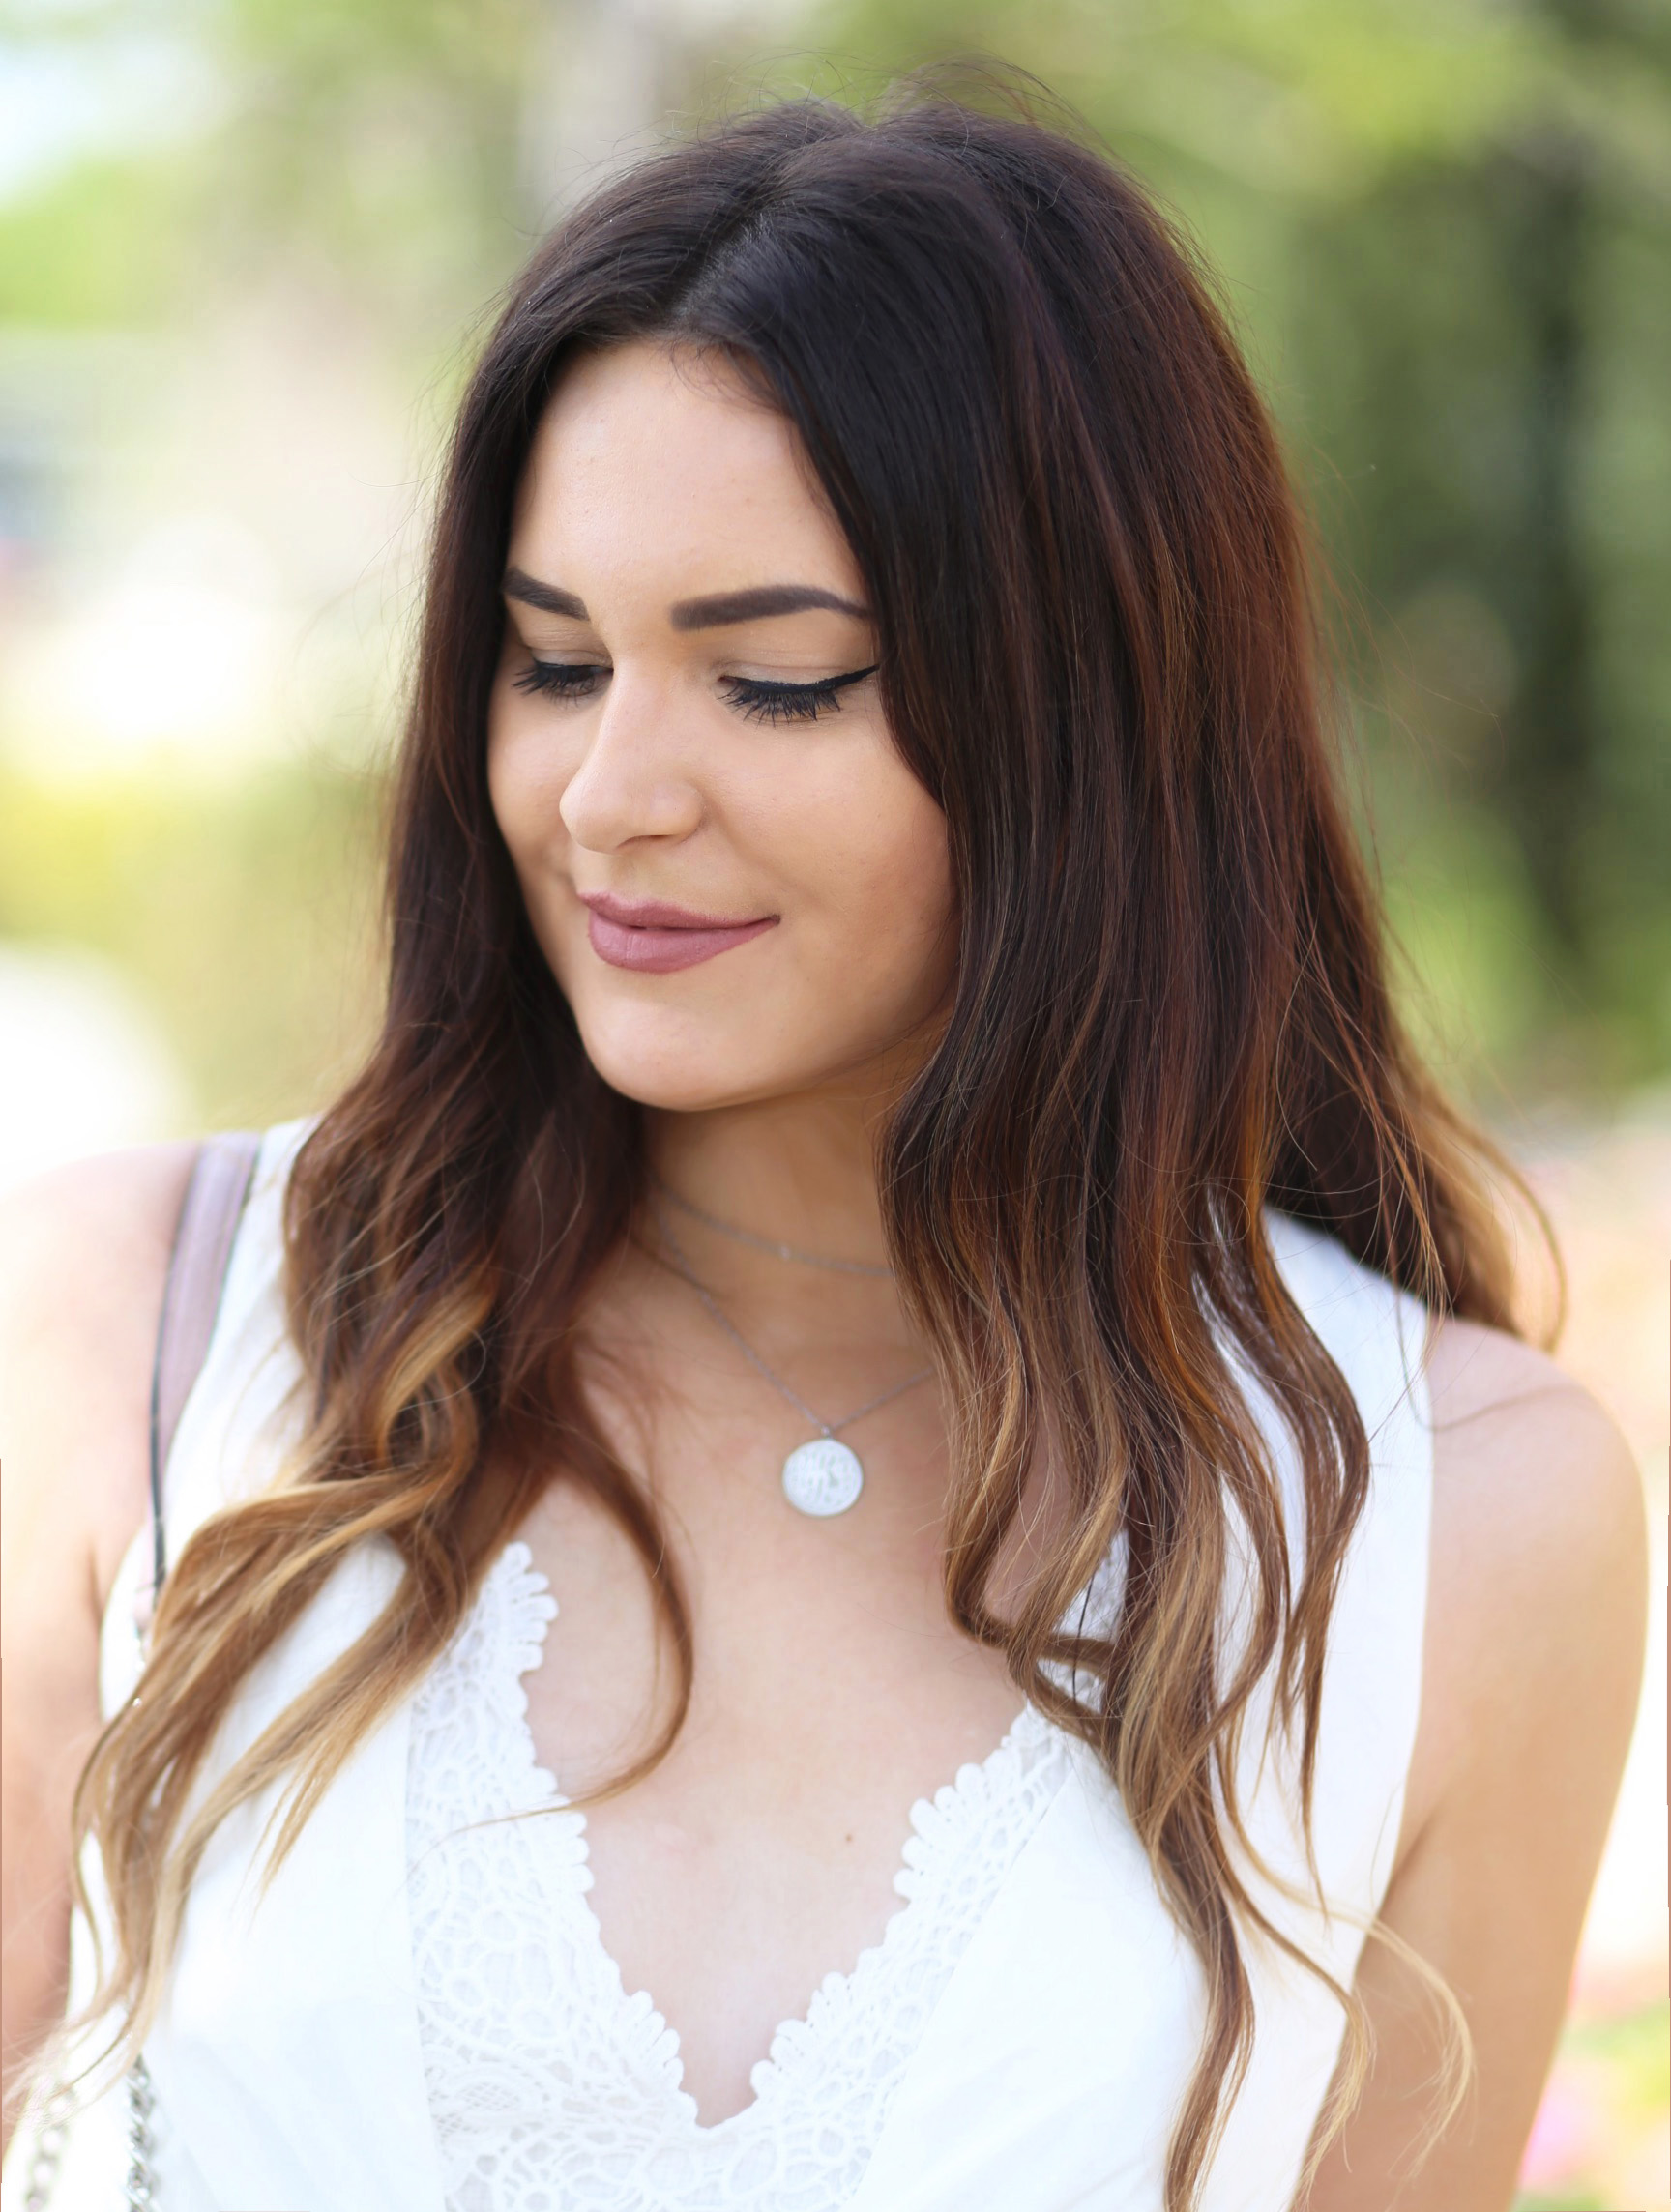 Mash Elle beauty blogger white dress spring outfit park